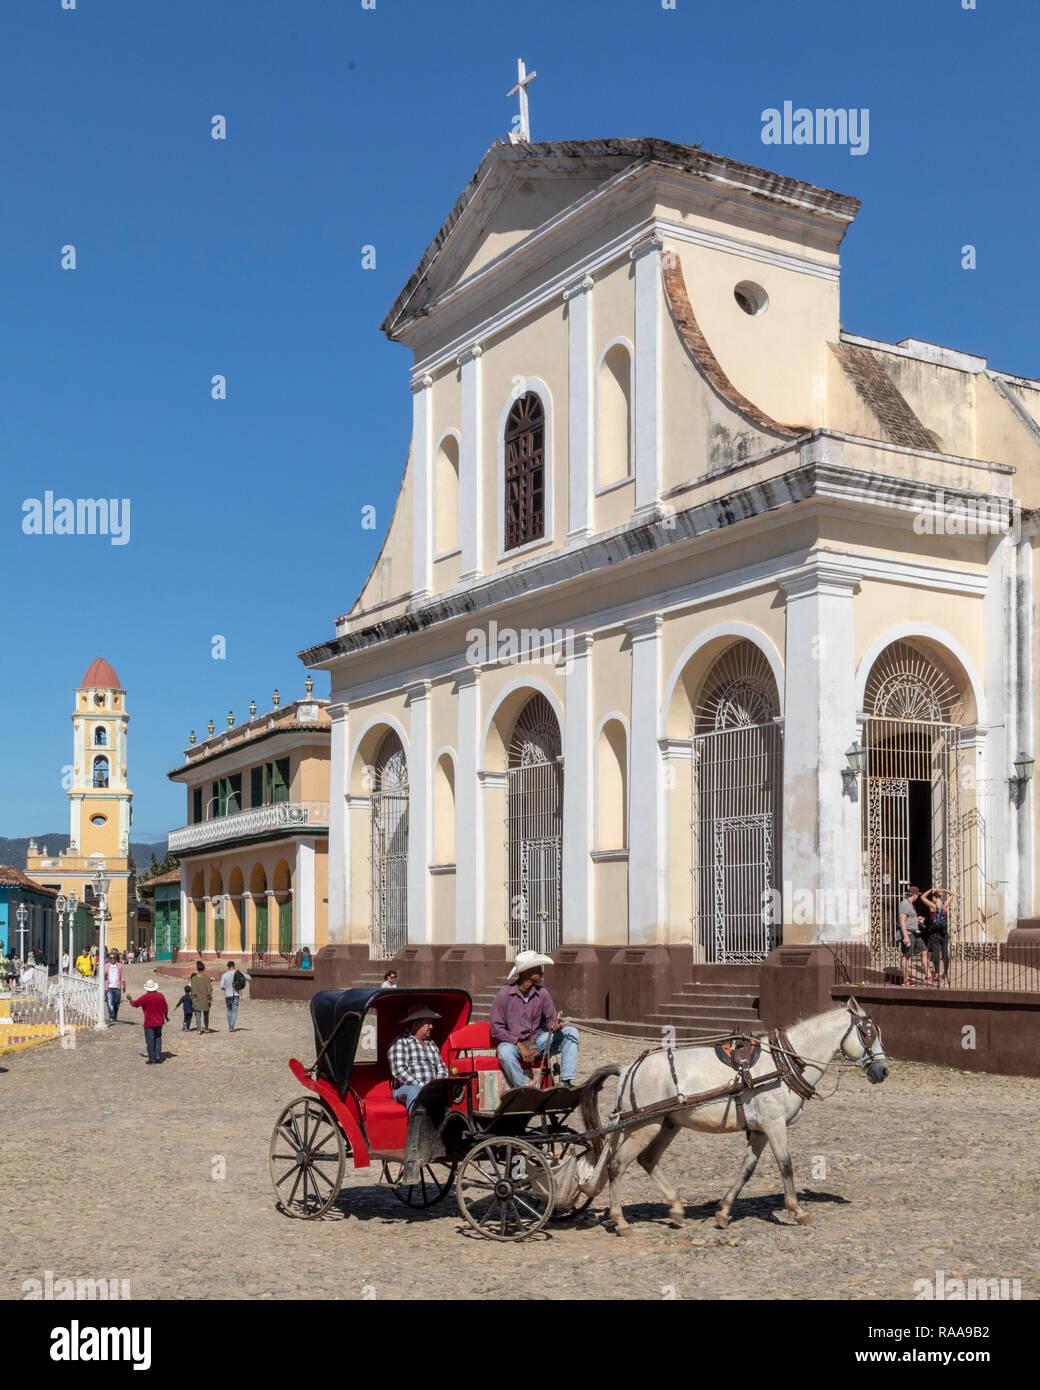 Horse carriage in front of Iglesia Santisima Trinidad, Trinidad, Cuba - Stock Image